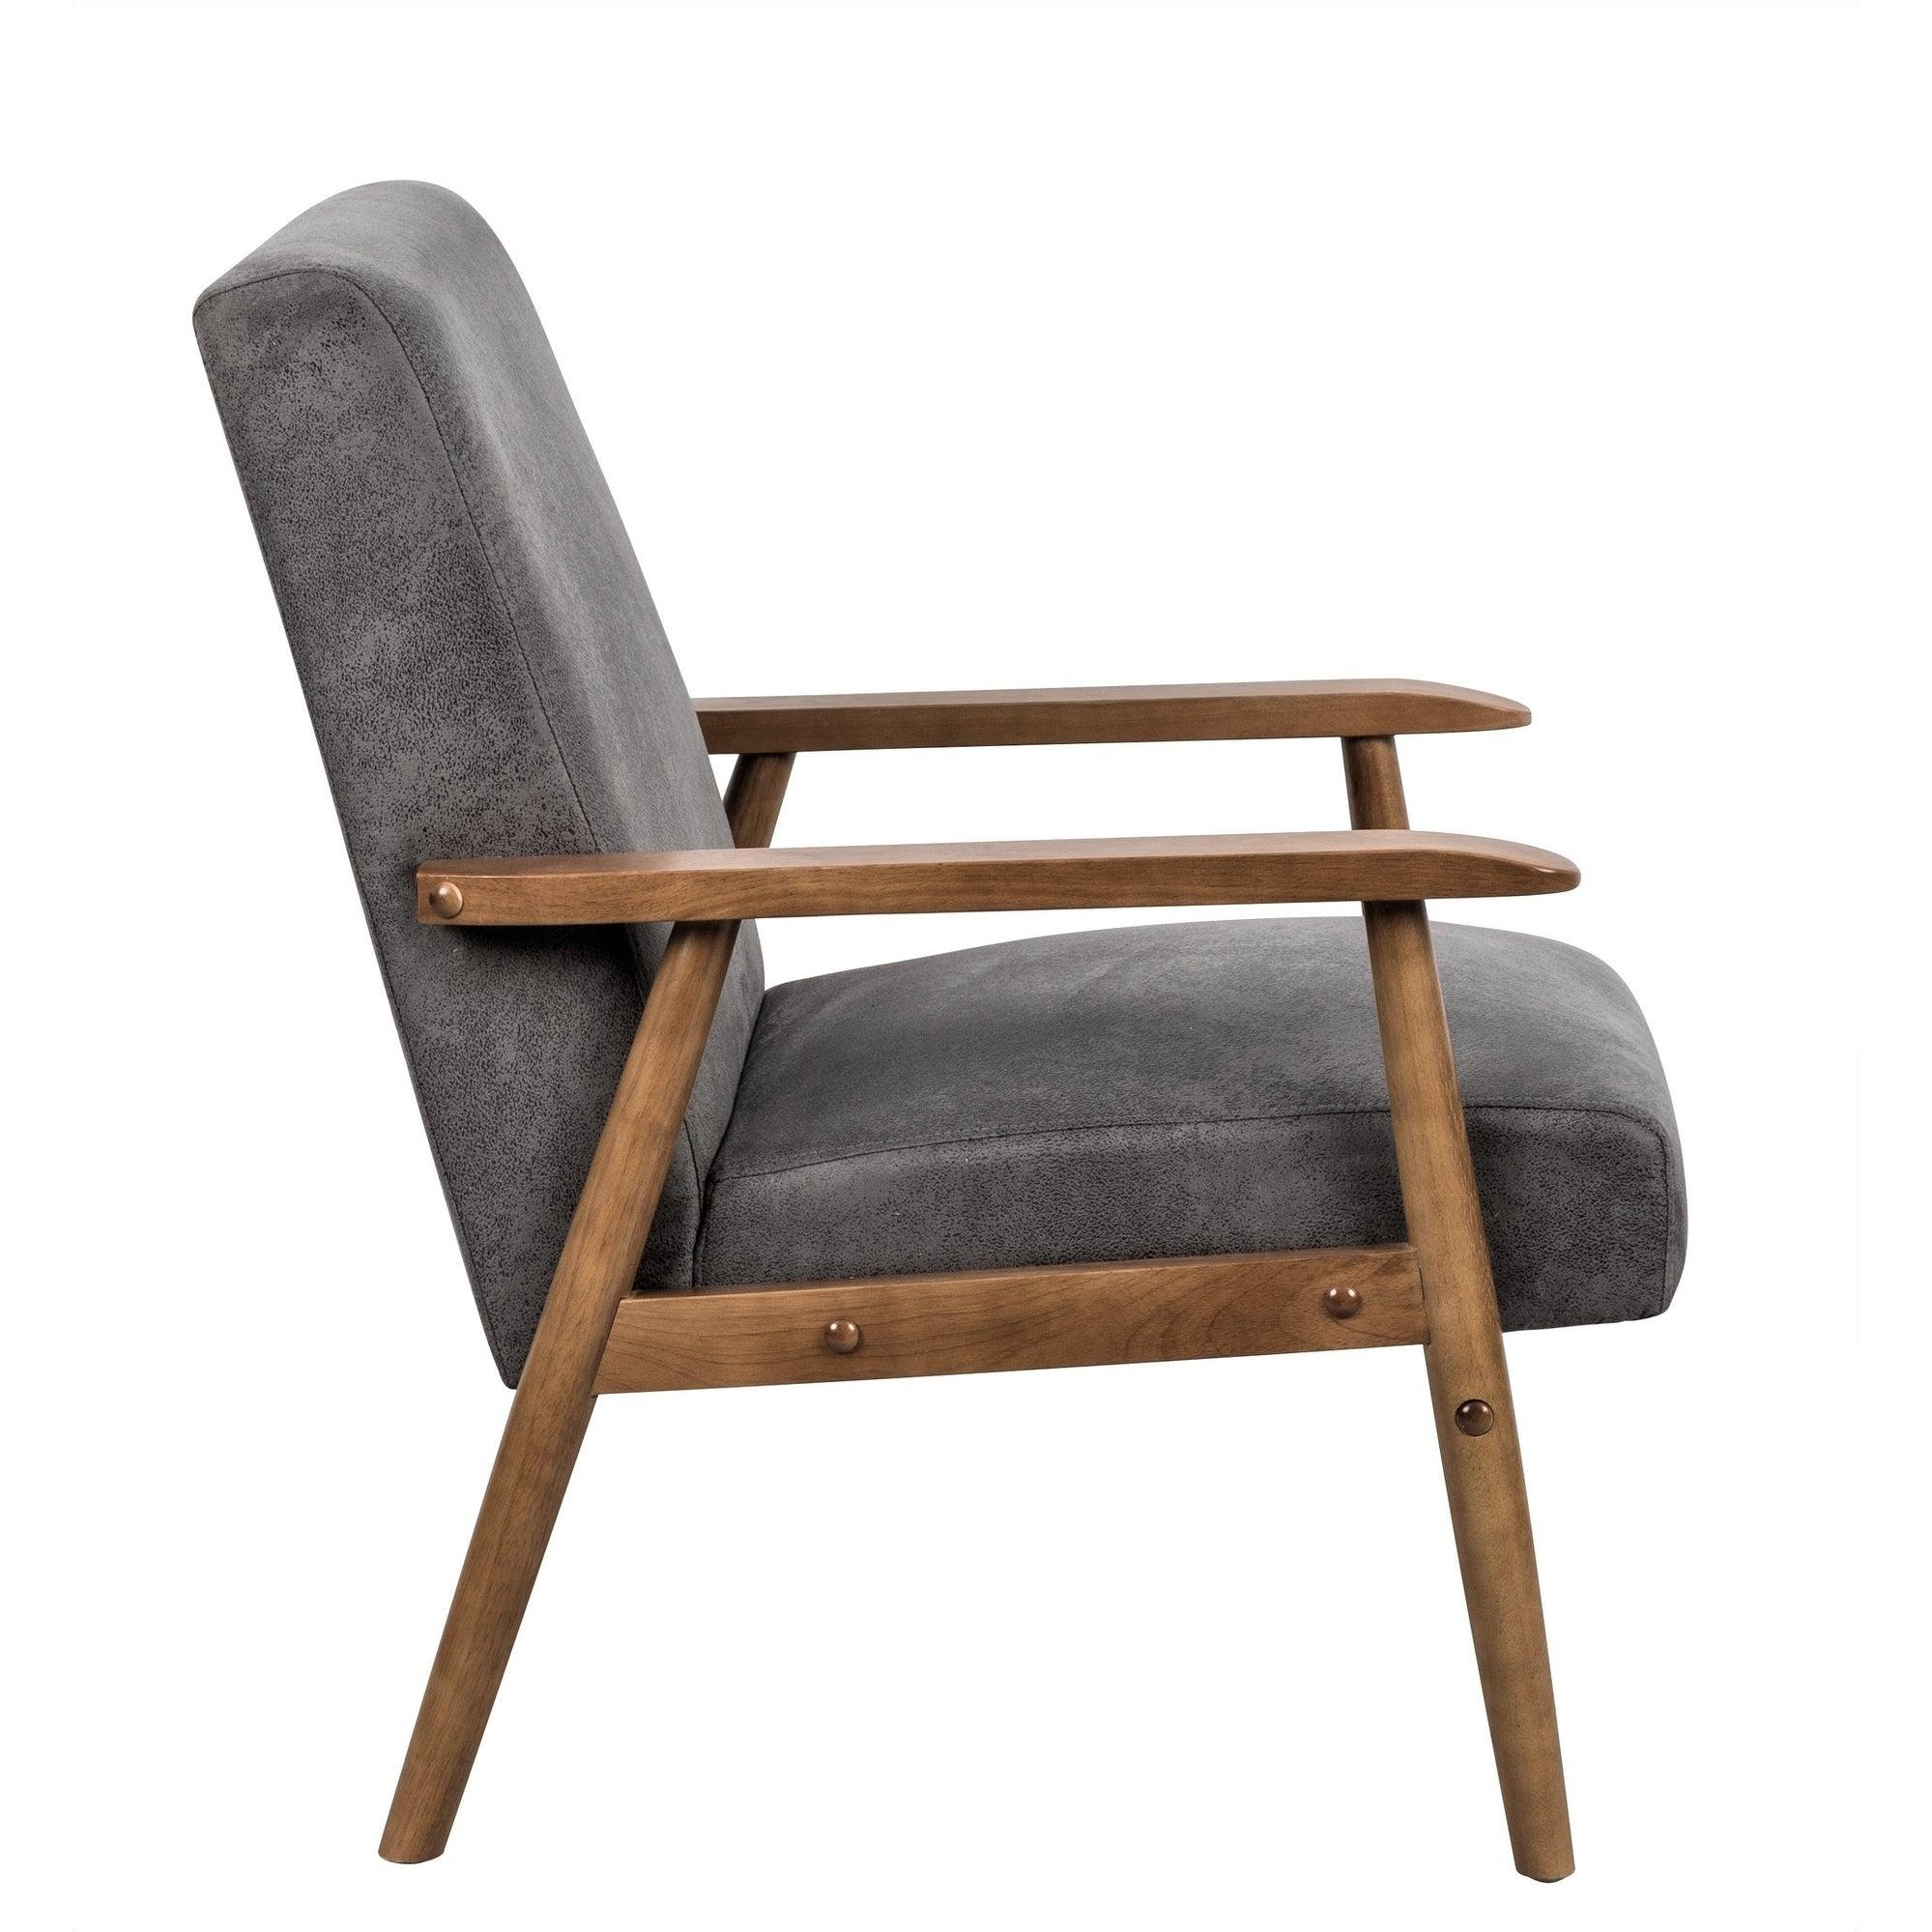 "Beachwood 21"" Arm Chair With Regard To Beachwood Arm Chairs (View 2 of 15)"